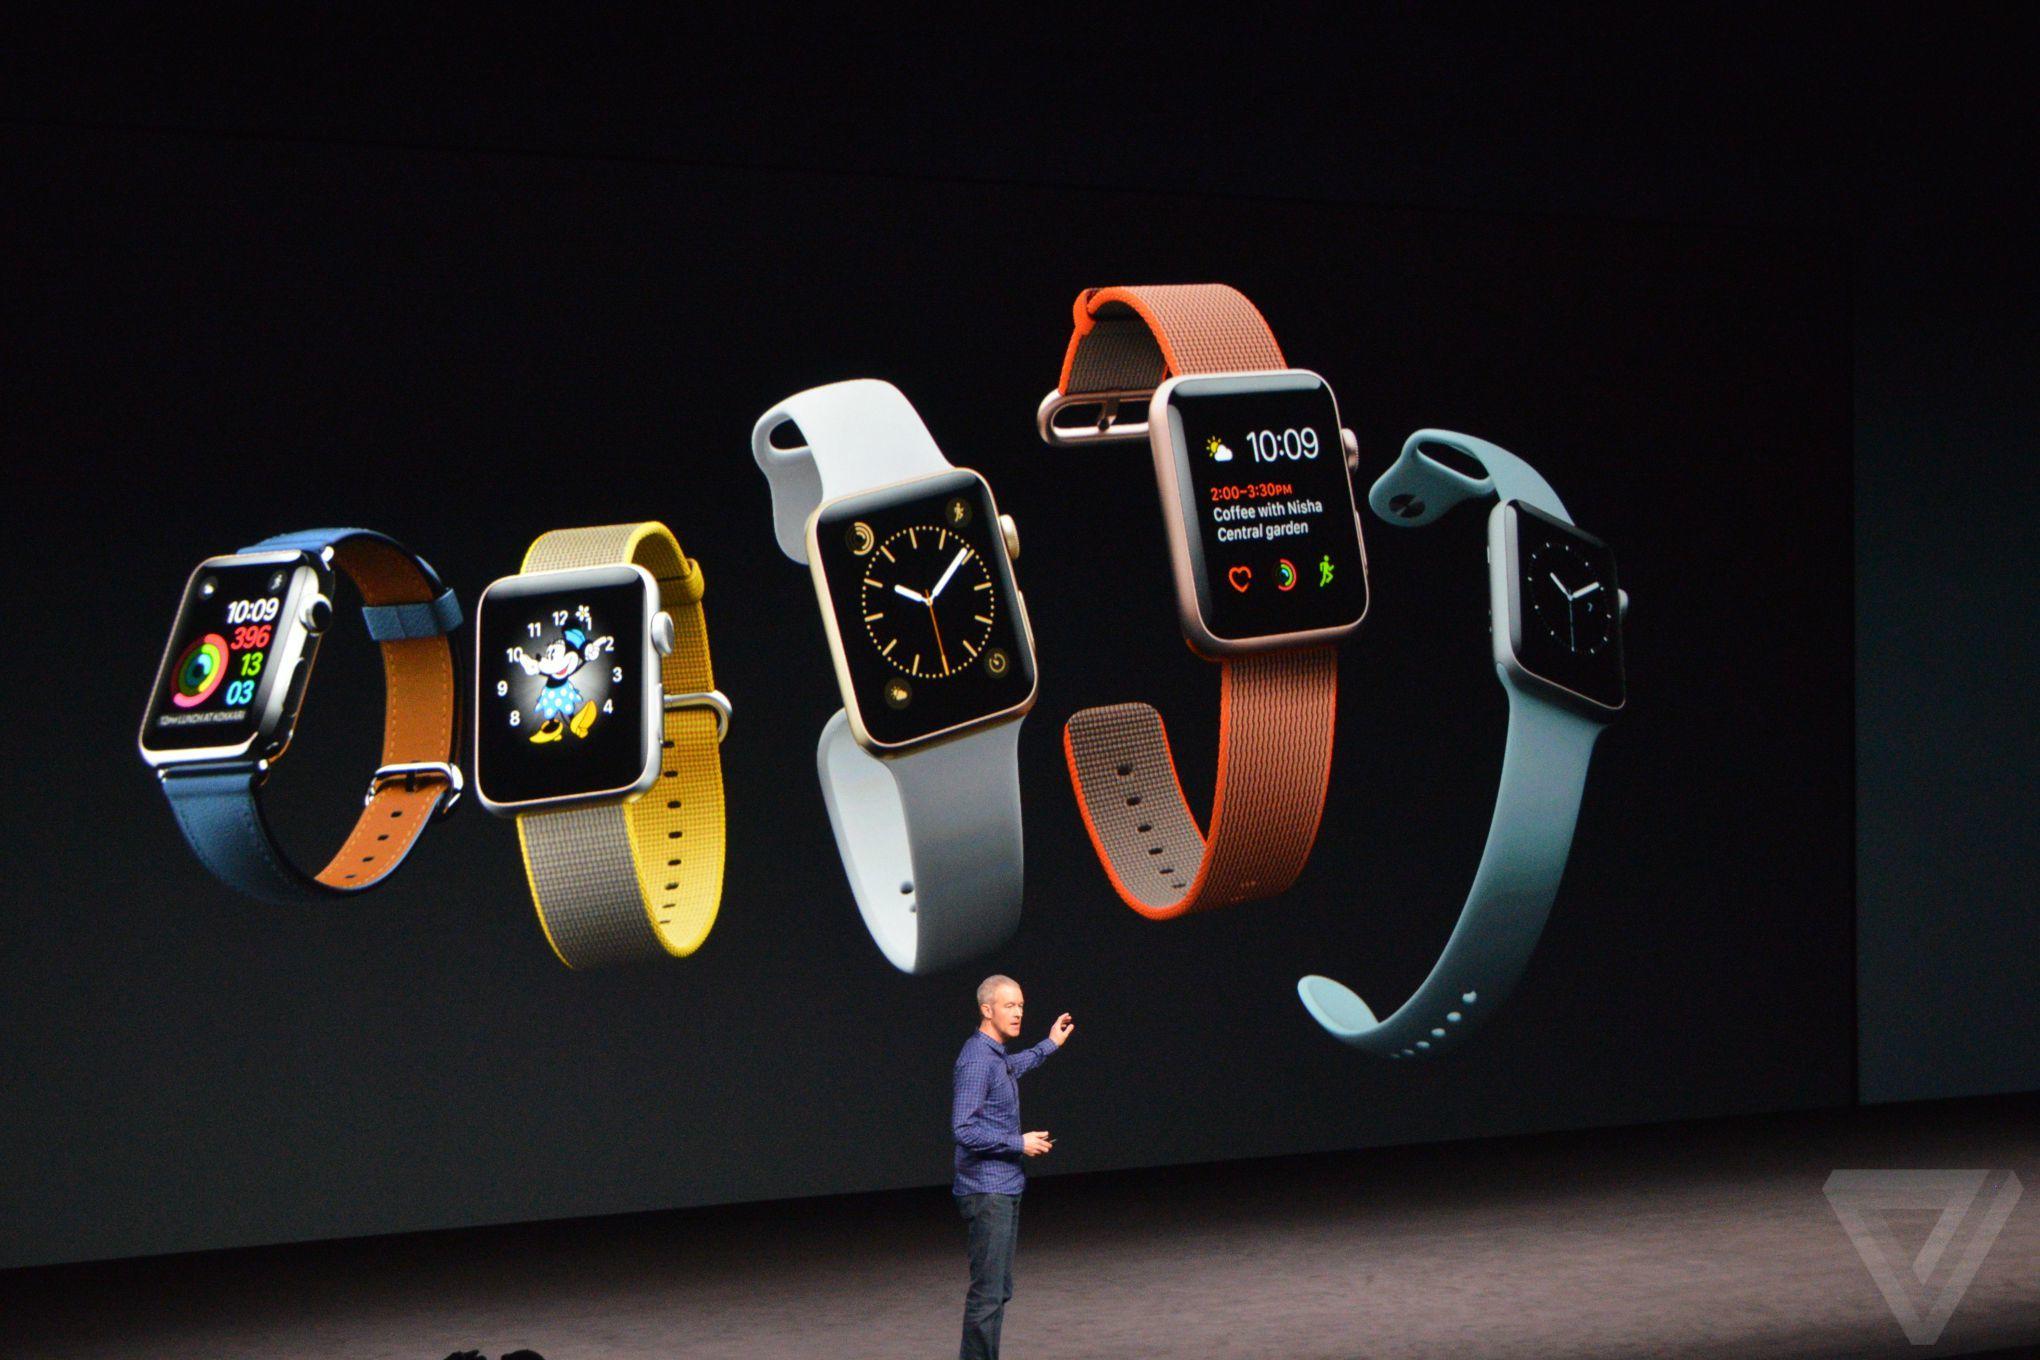 apple-watch-series-2-070916